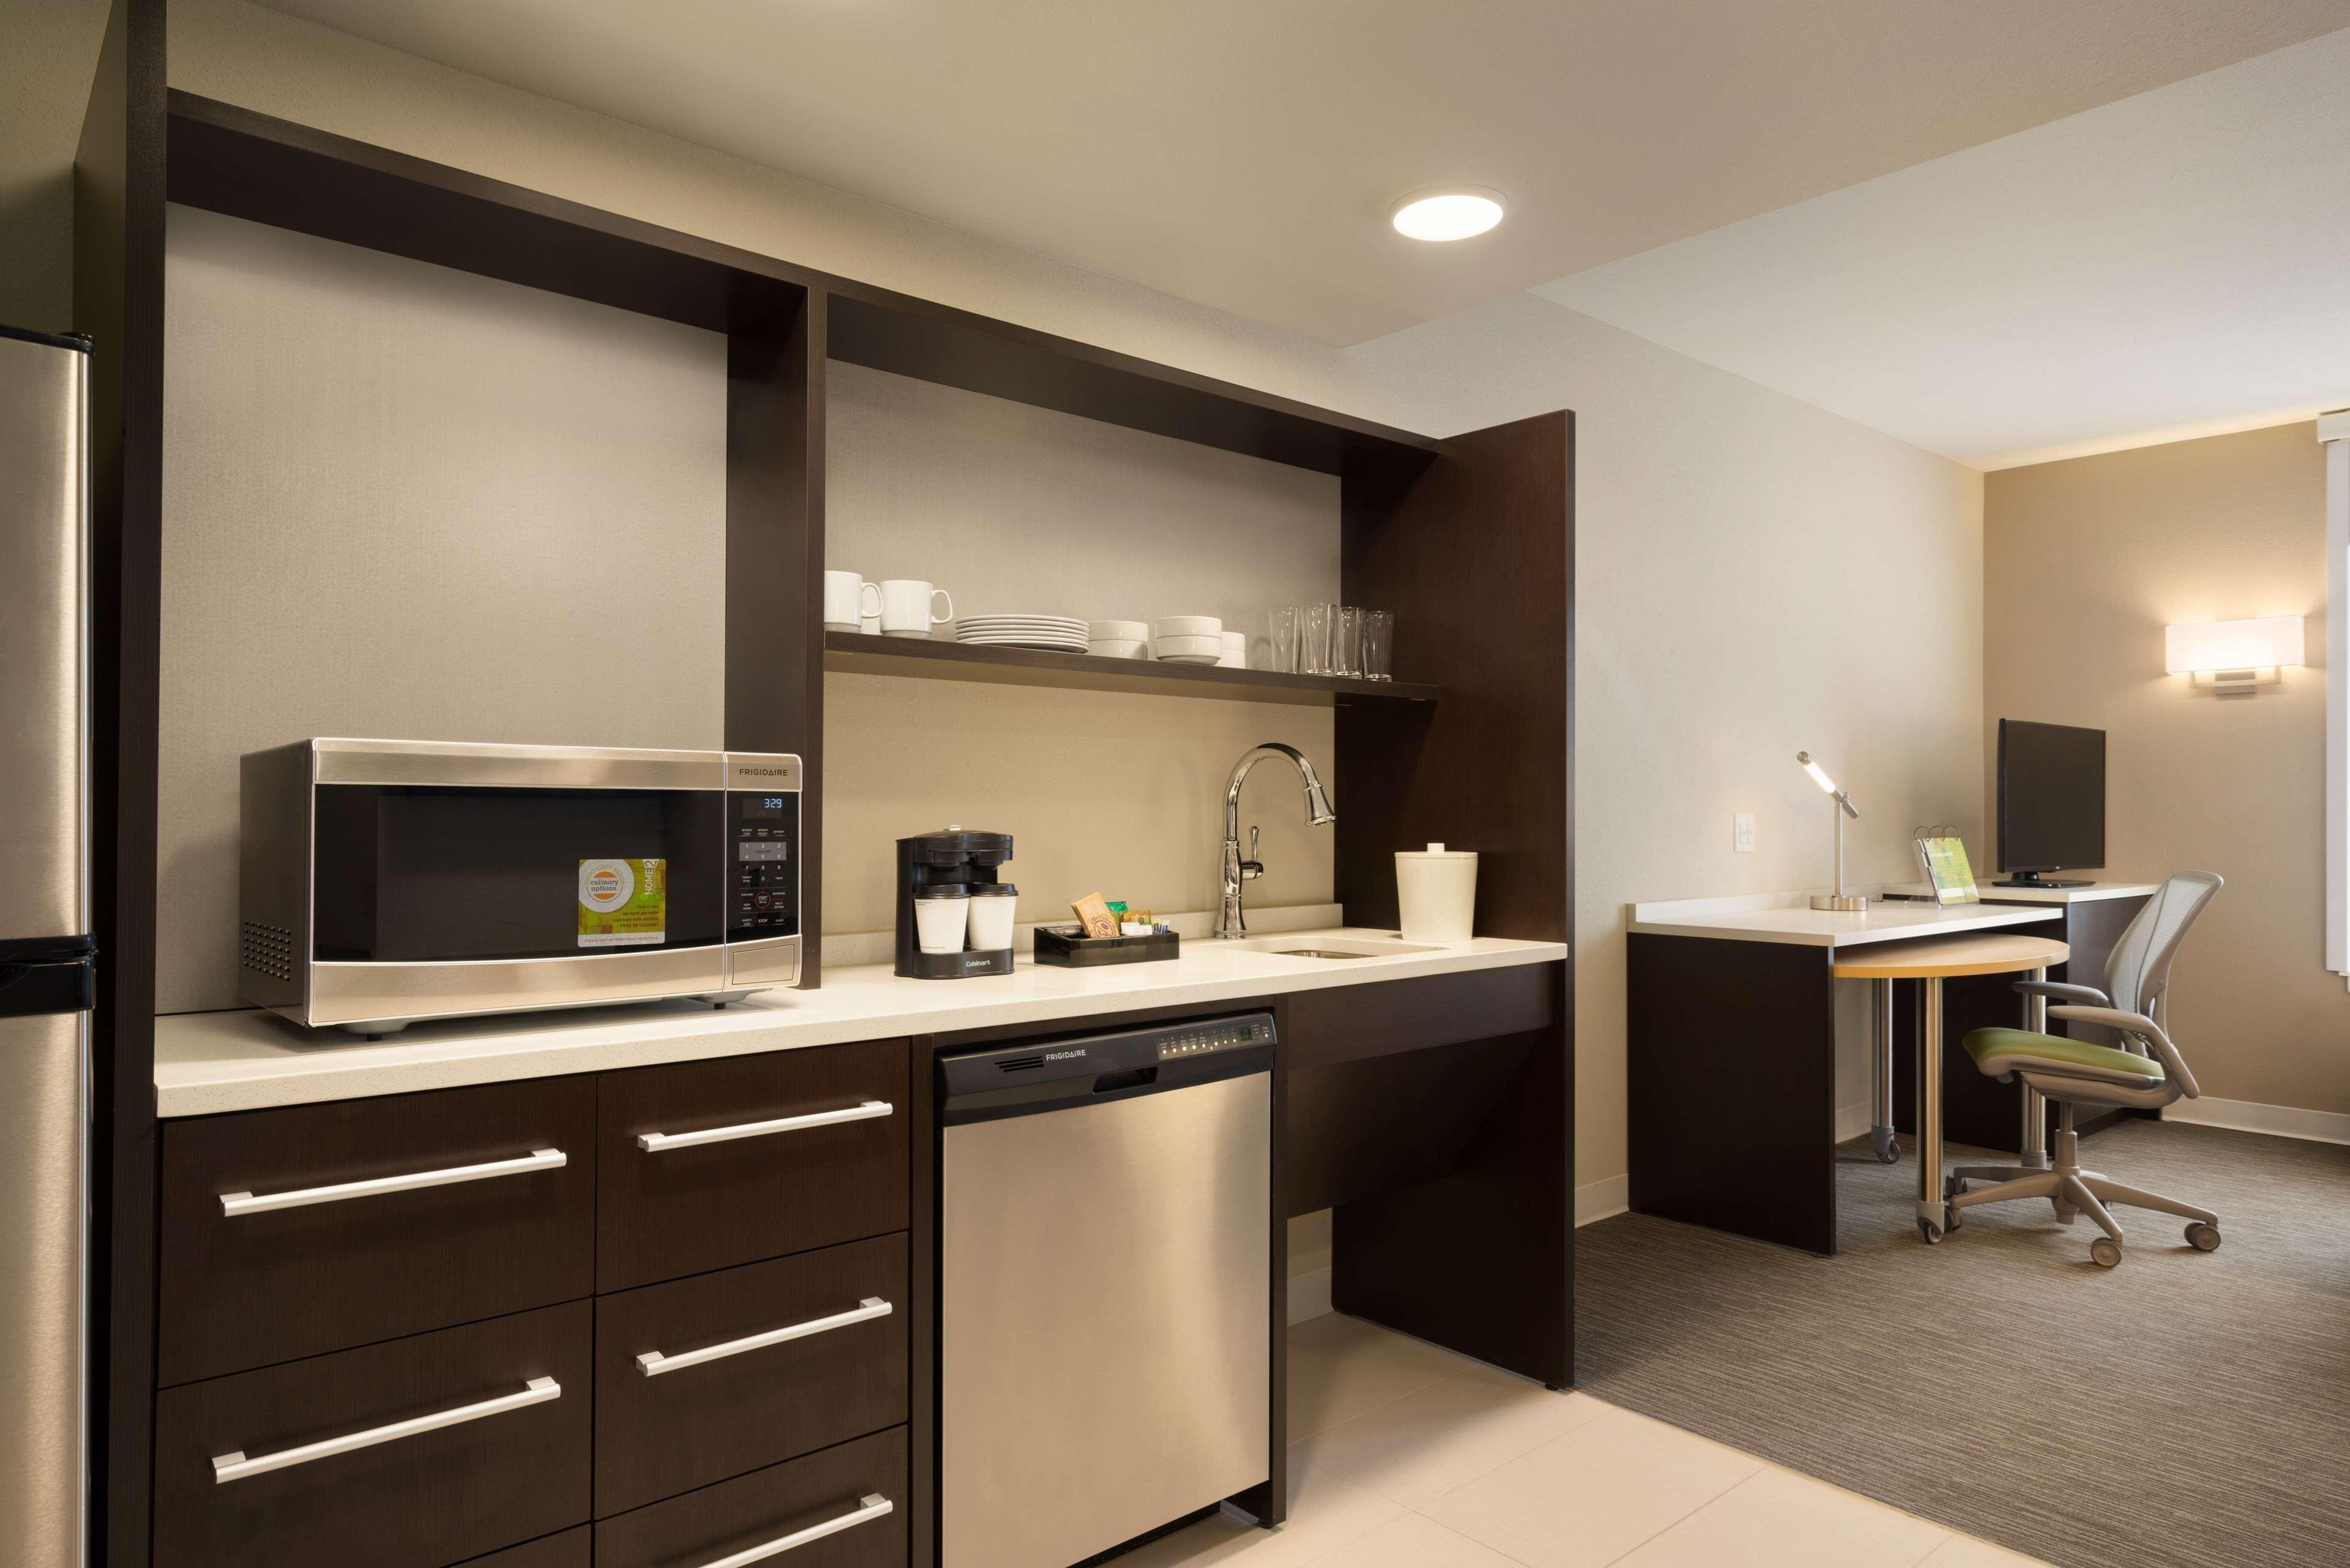 Home2 Suites by Hilton Leavenworth Downtown image 14